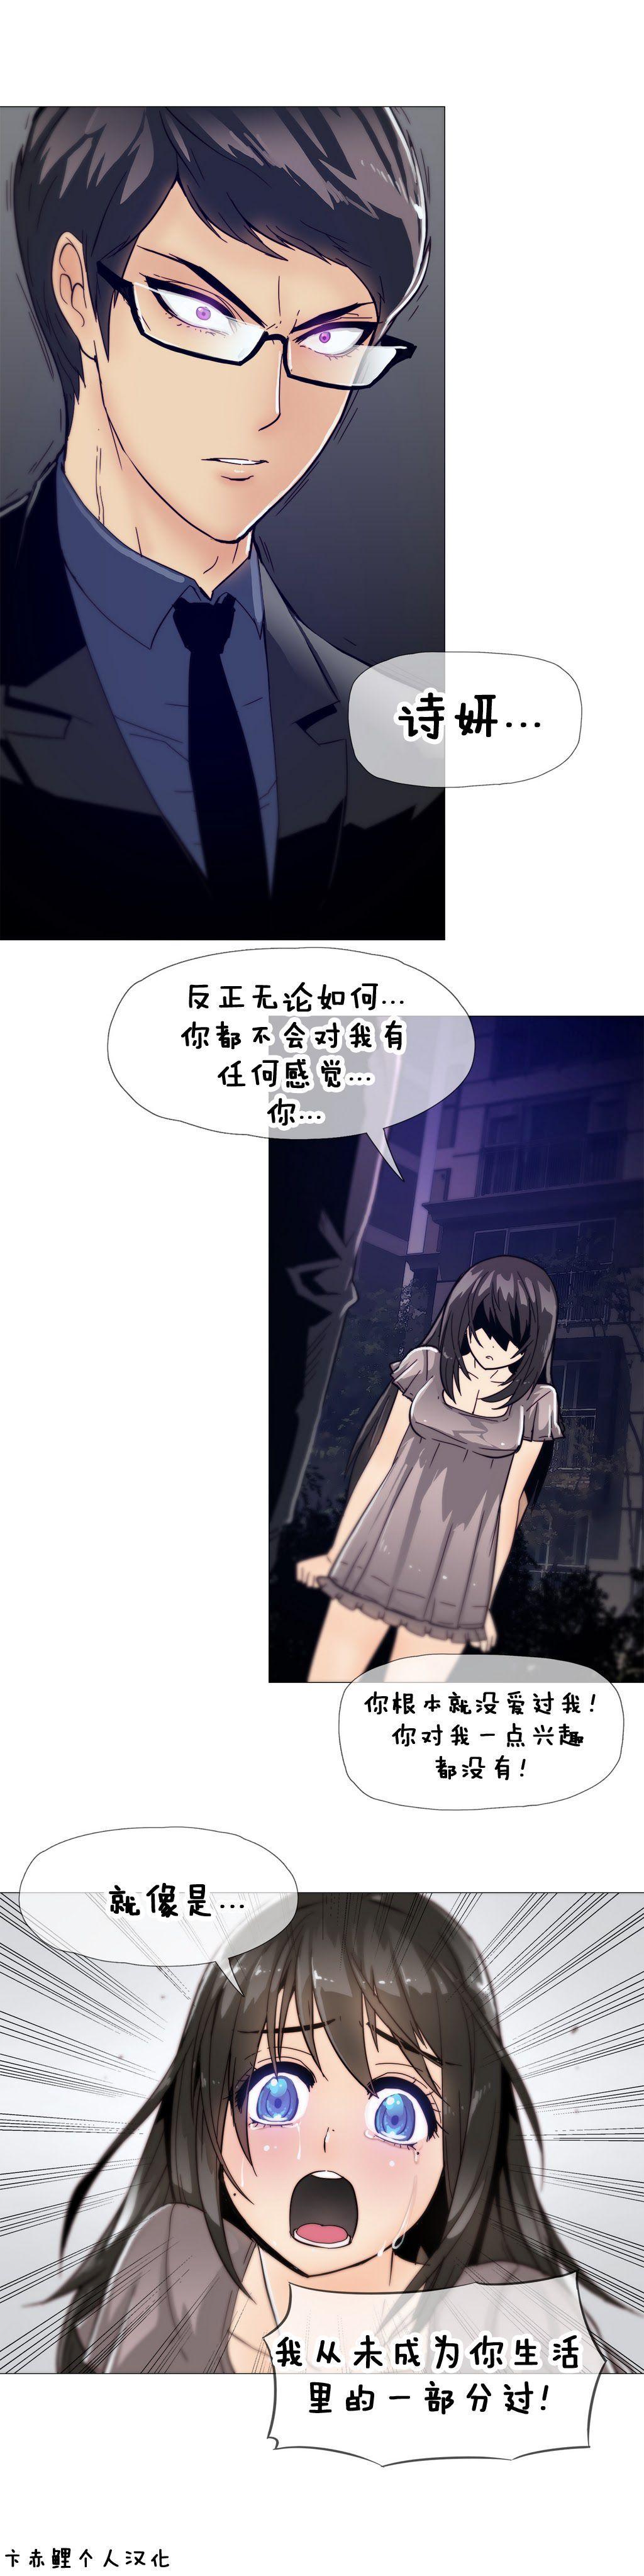 HouseHold Affairs 【卞赤鲤汉化】1~15话 224